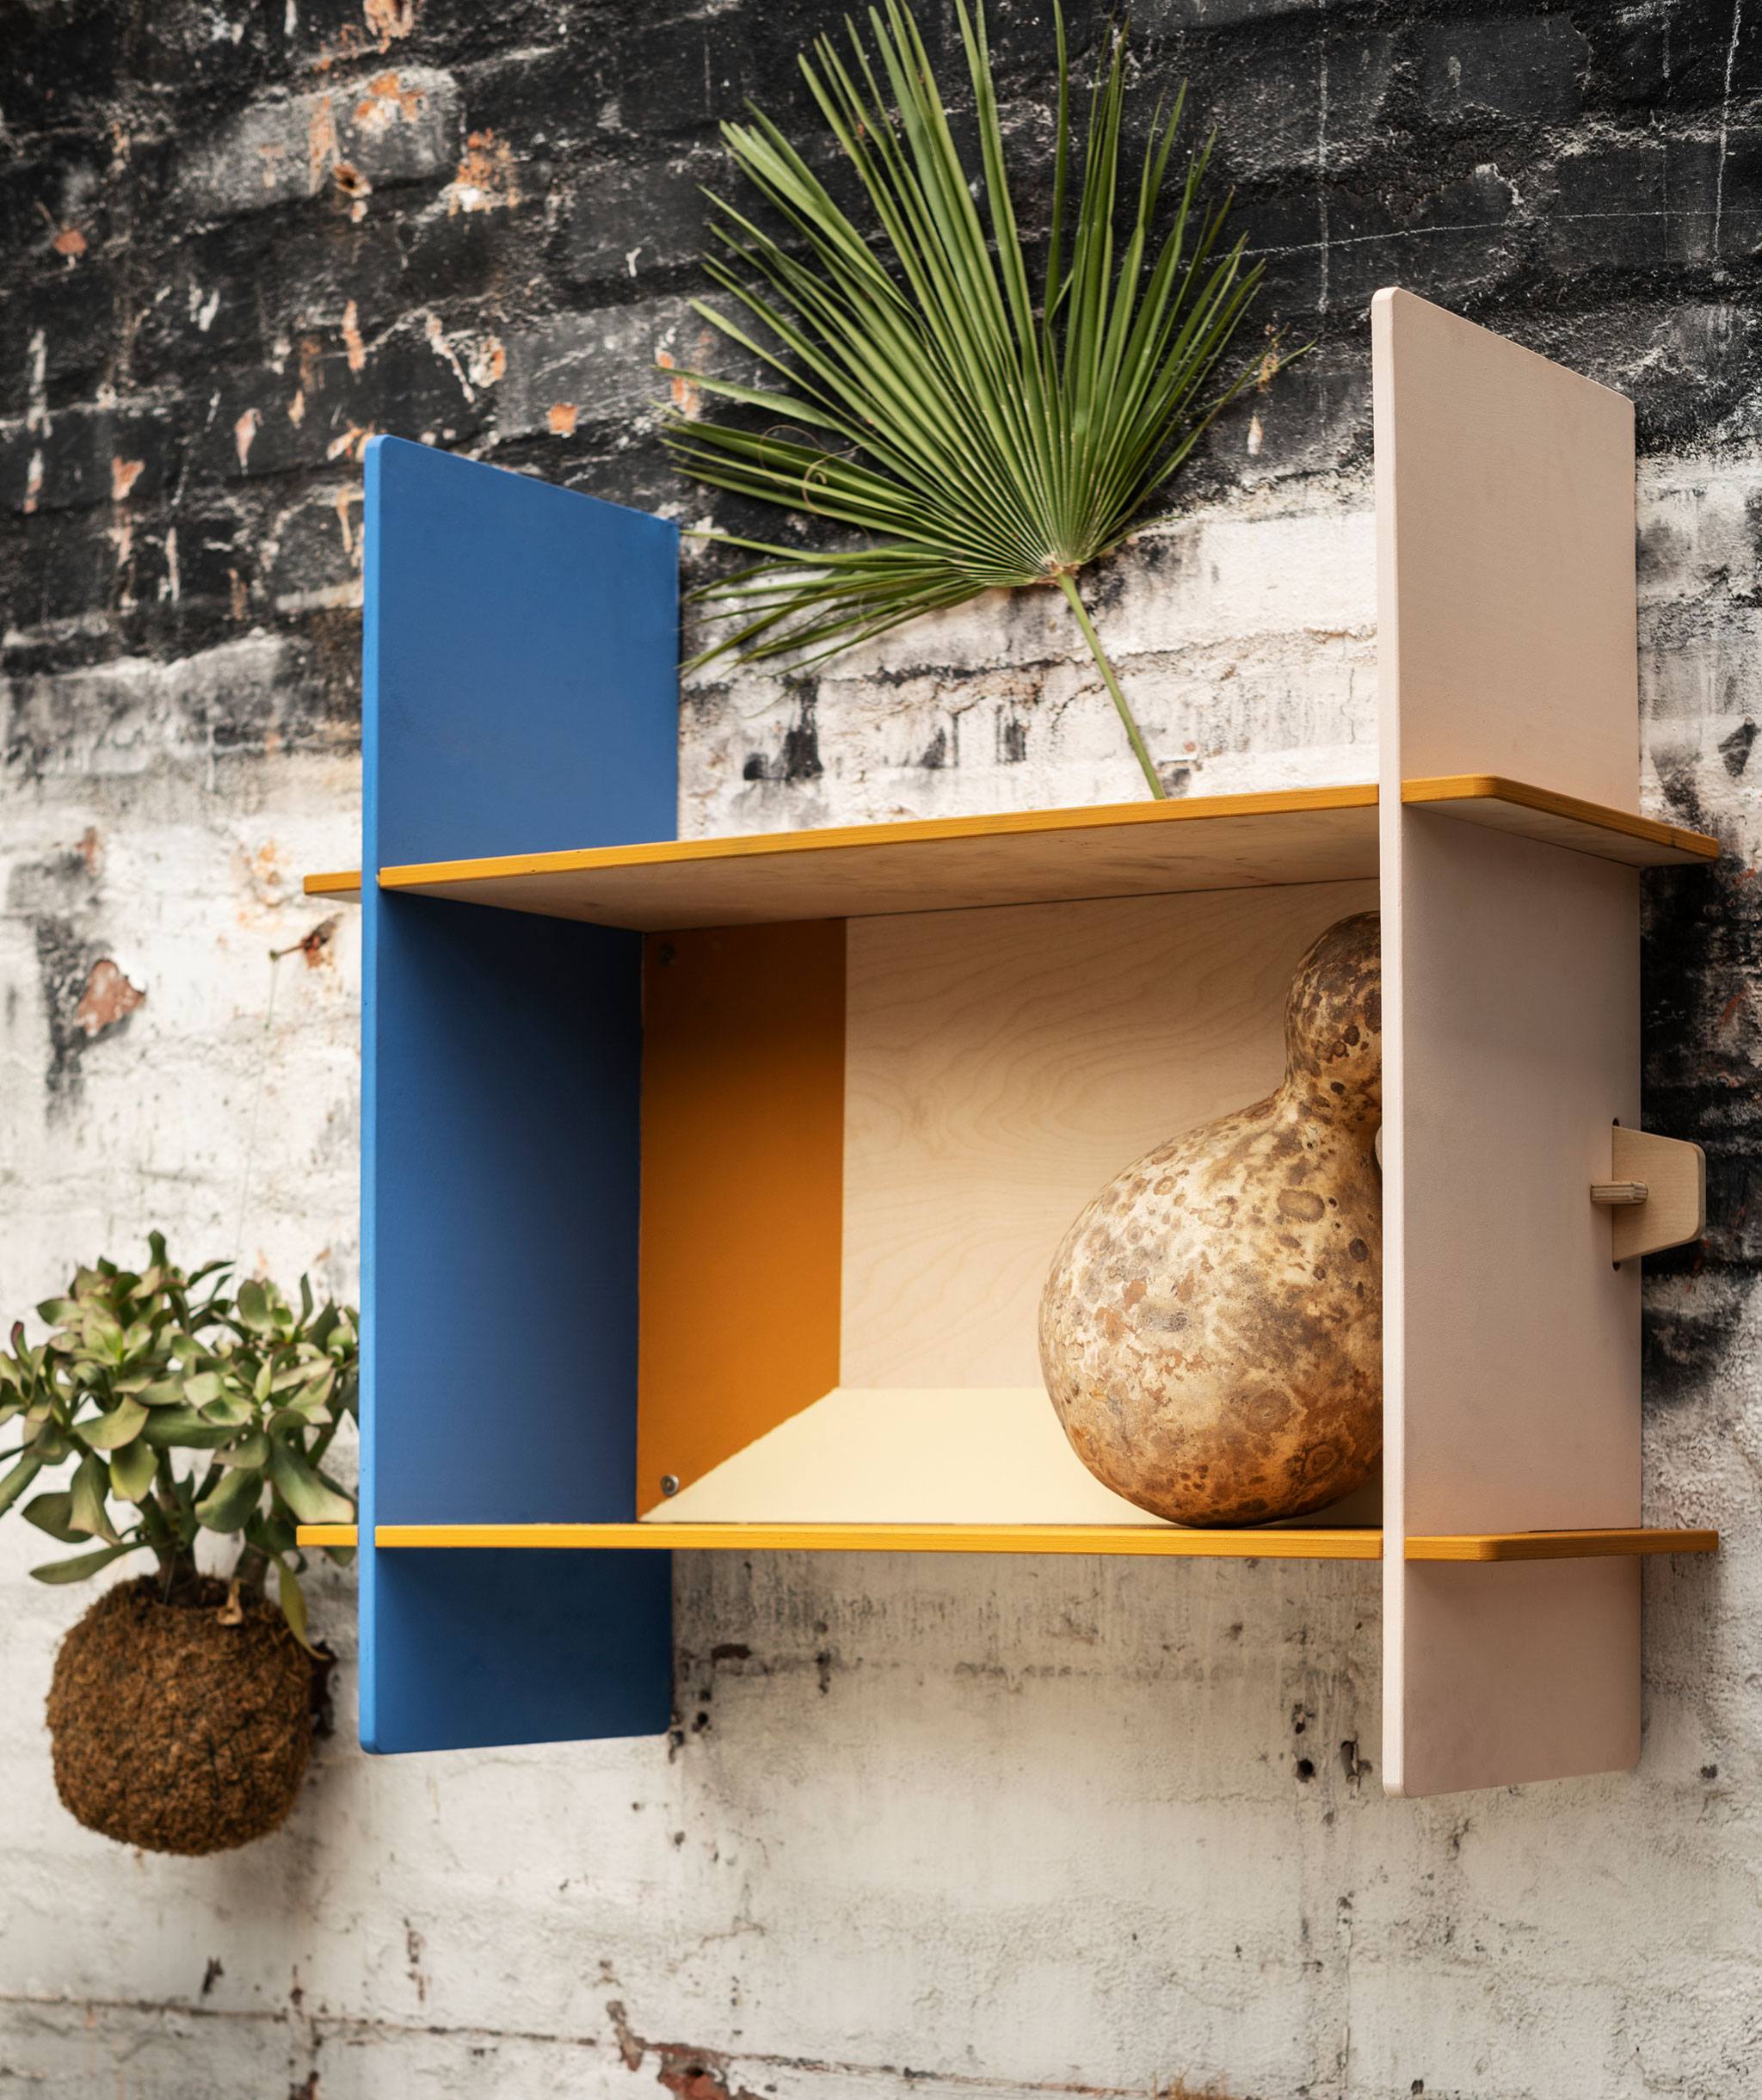 Rak dinding kecil persegi panjang yang terbuat dari plywood, dipasang pada dinding bata kasar (mungkin di luar ruangan).